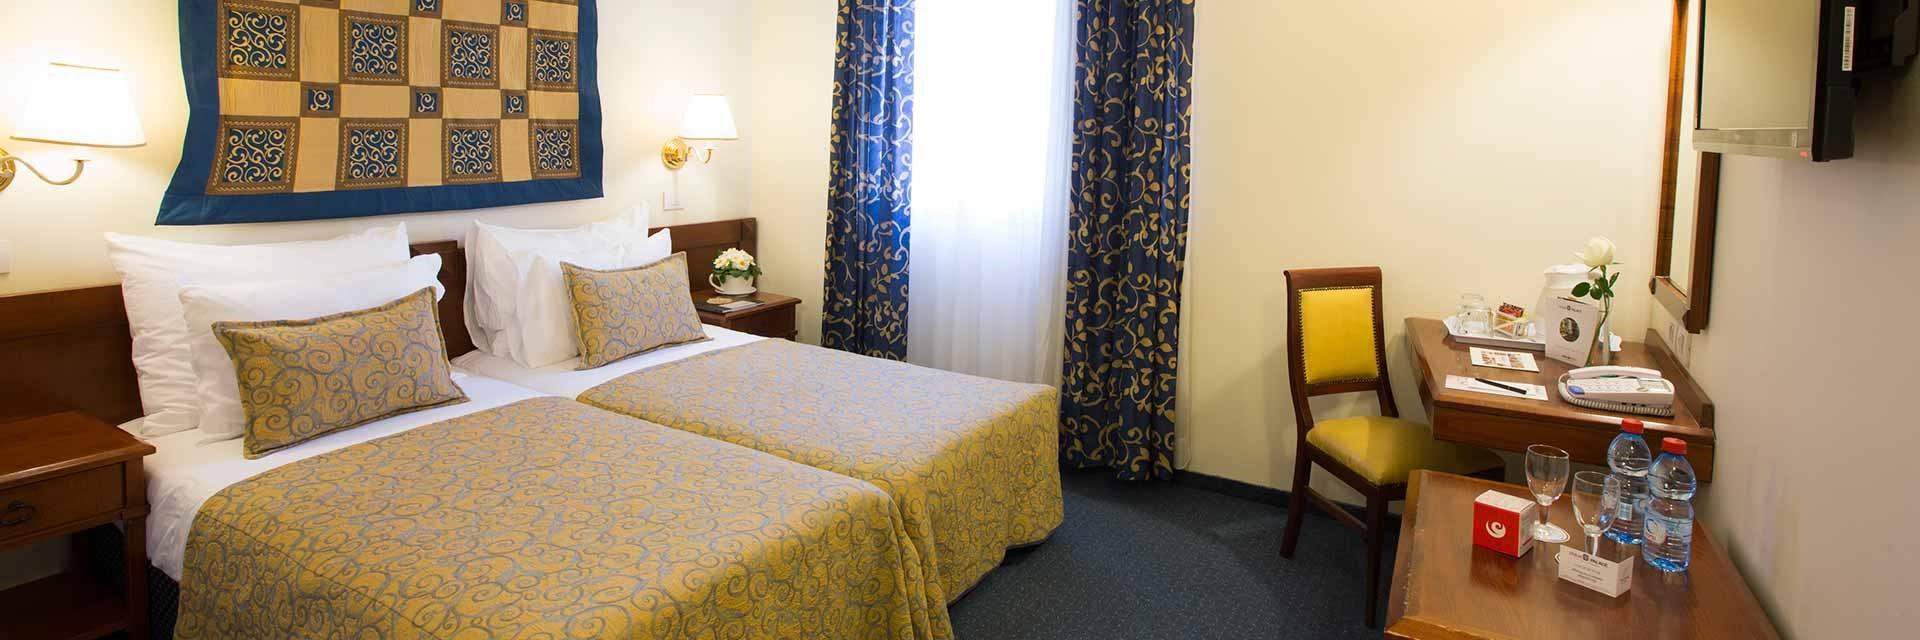 prima-palace-standard-room